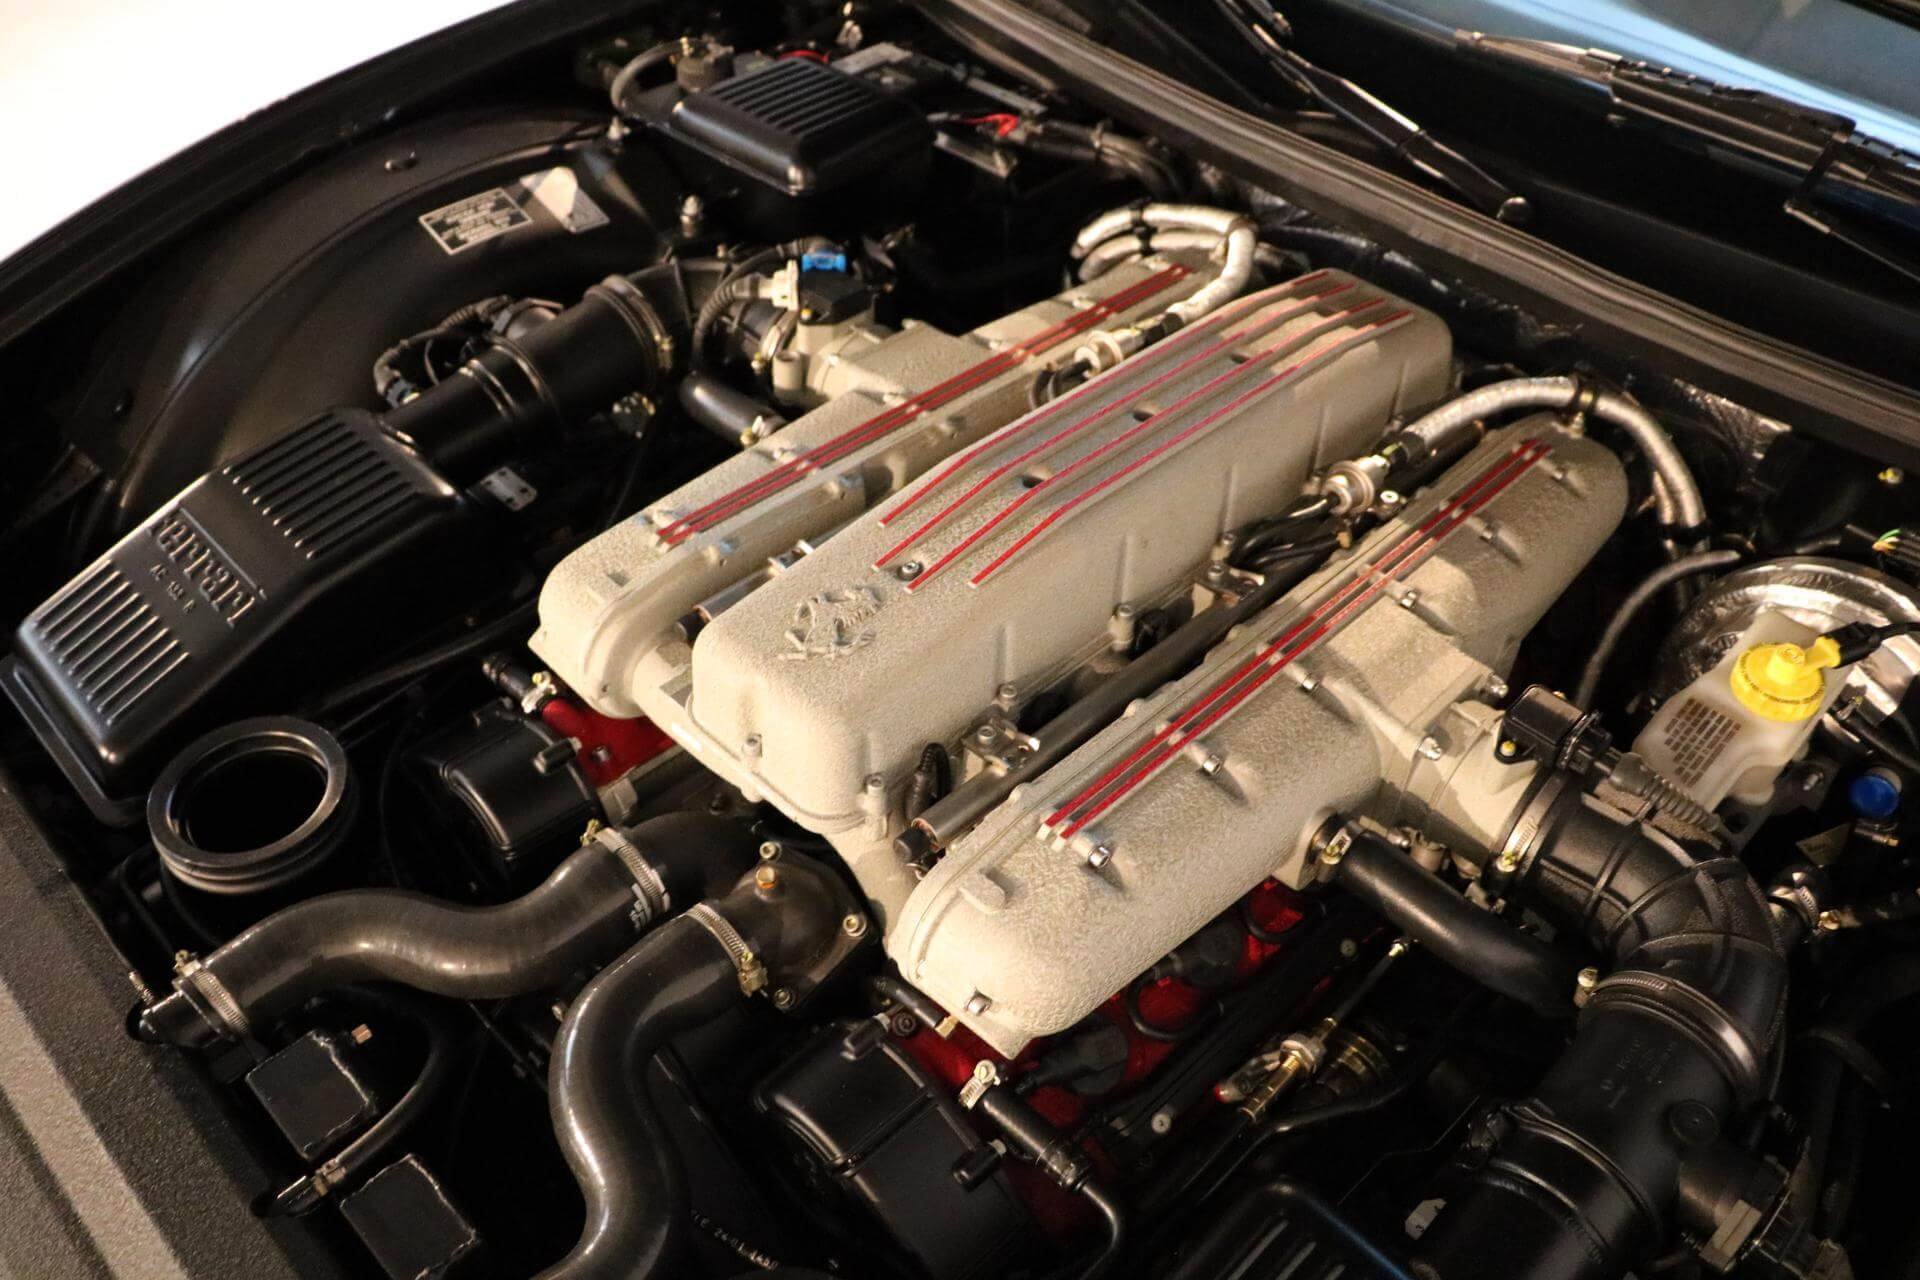 Real Art on Wheels | 2001 Ferrari 550 Barchetta